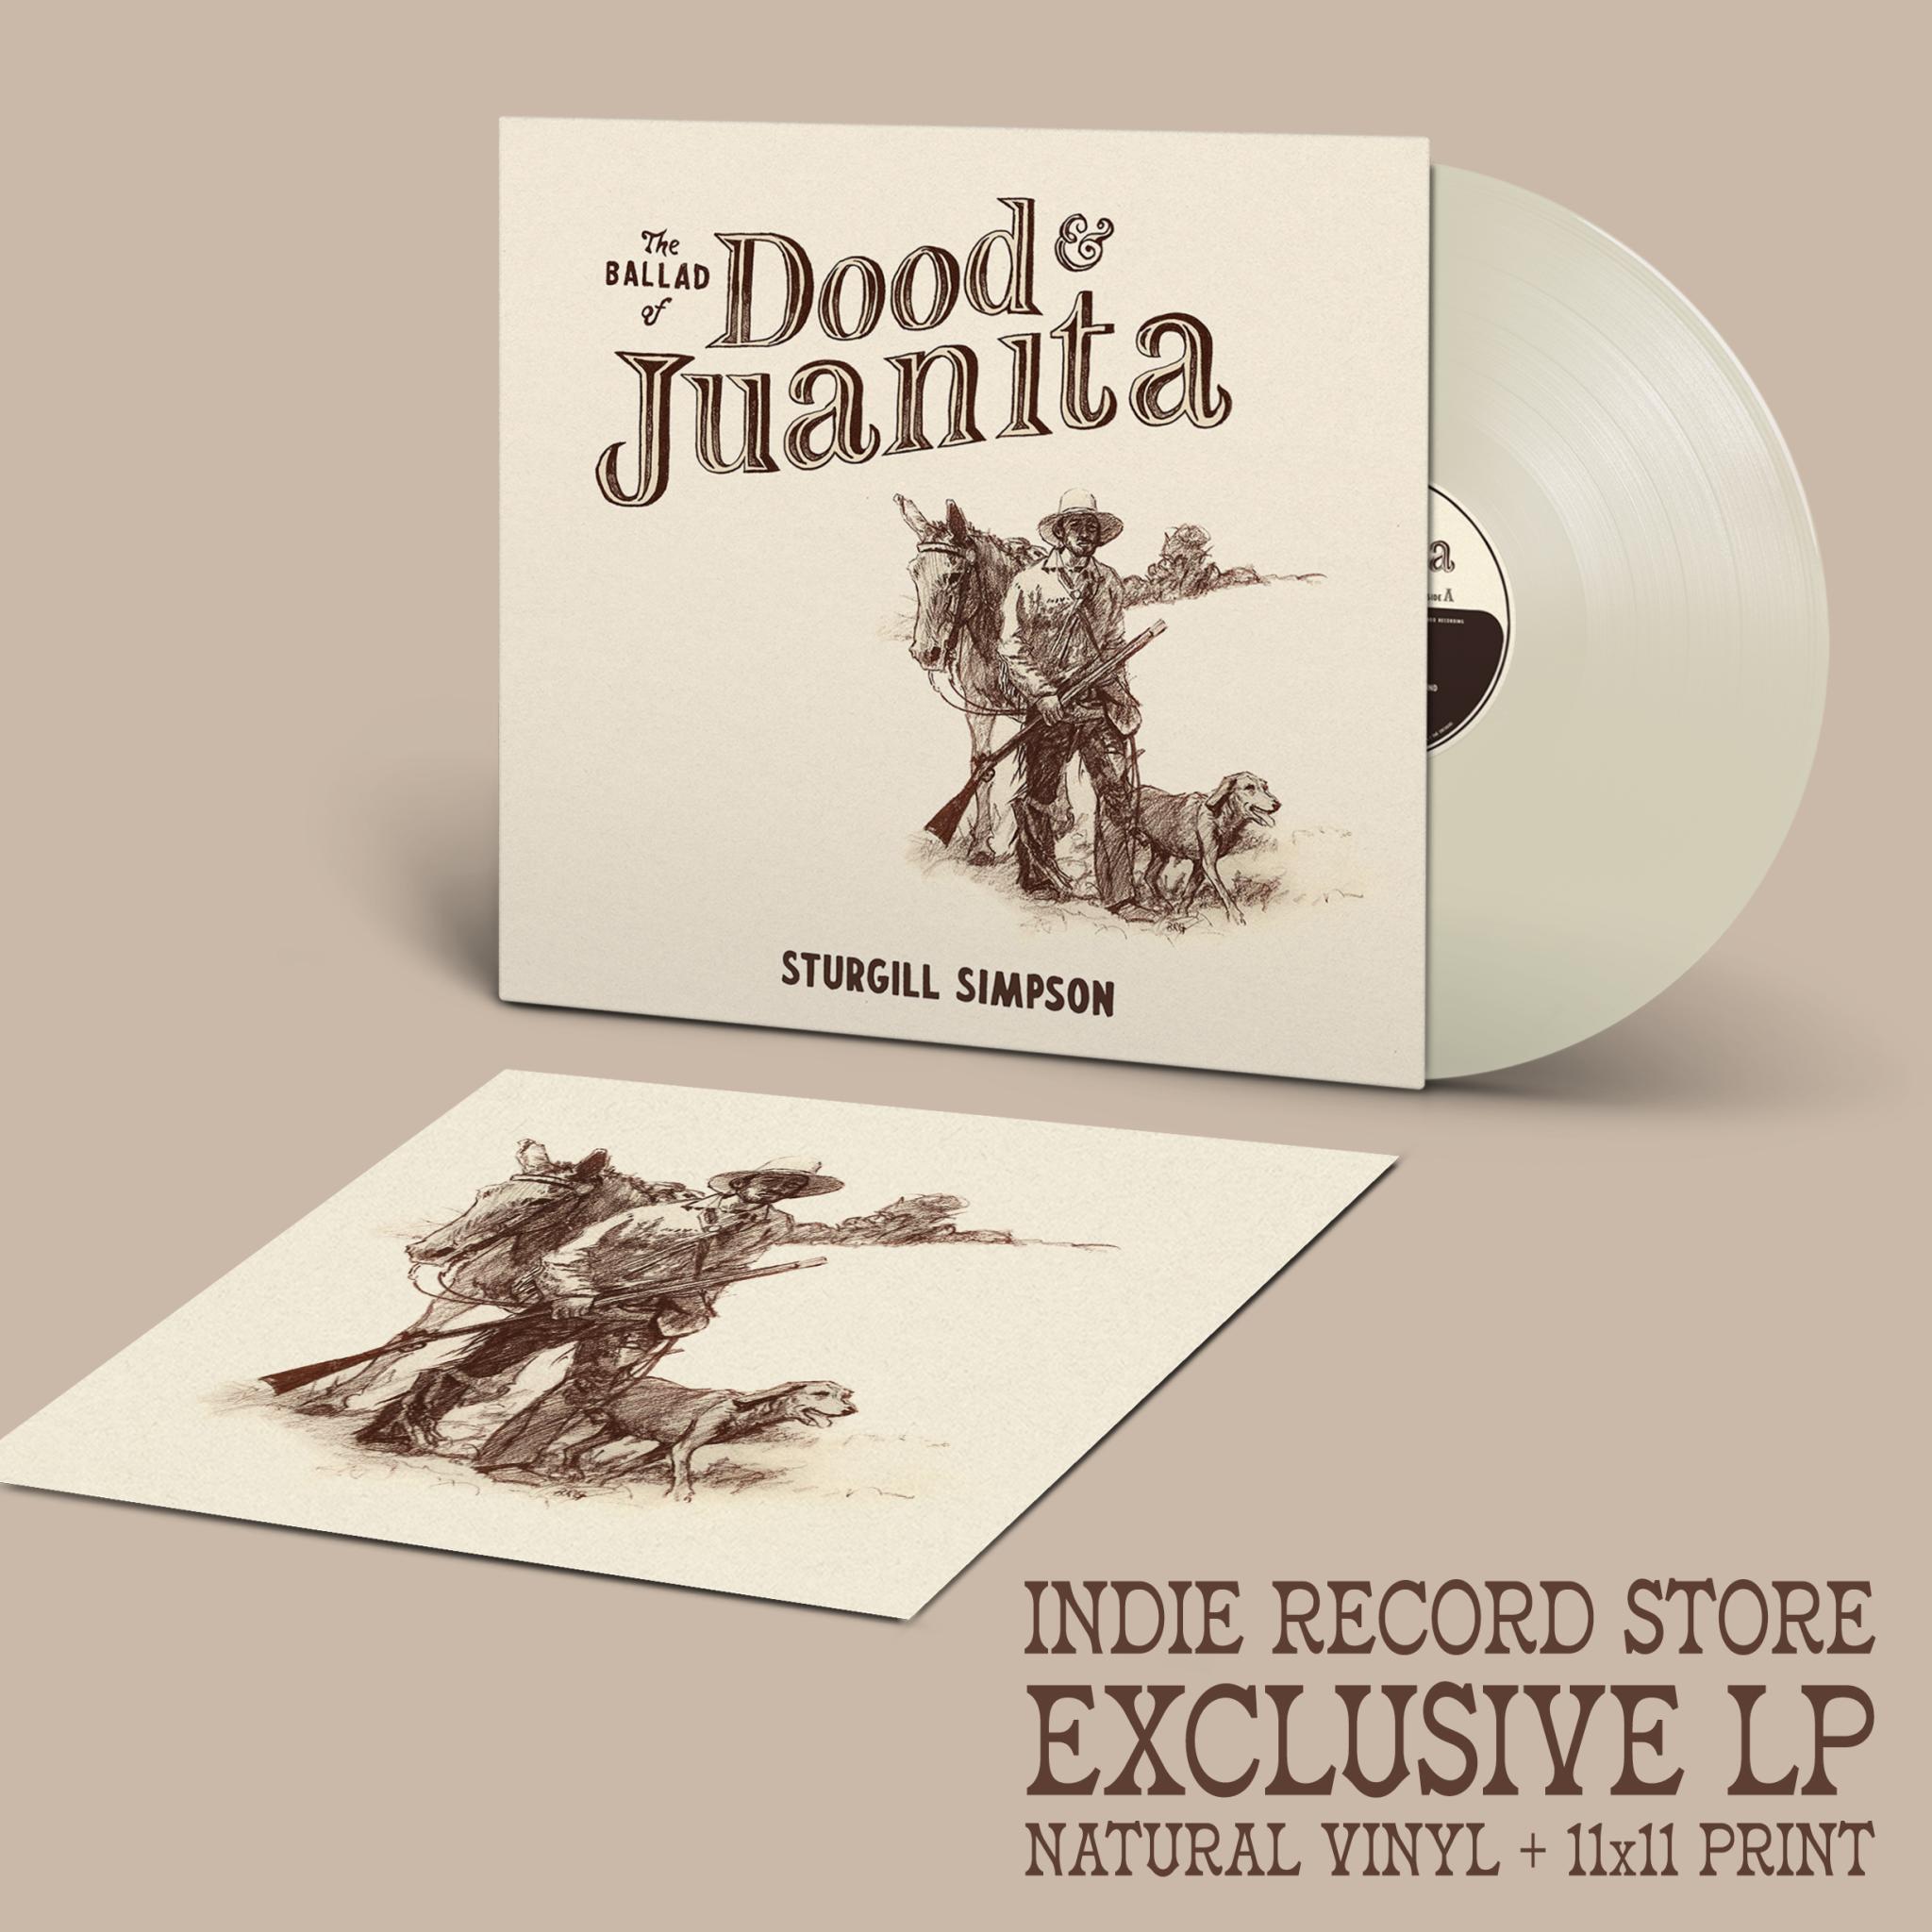 High Top Mountain Records Sturgill Simpson - The Ballad of Dood & Juanita (Coloured Vinyl)